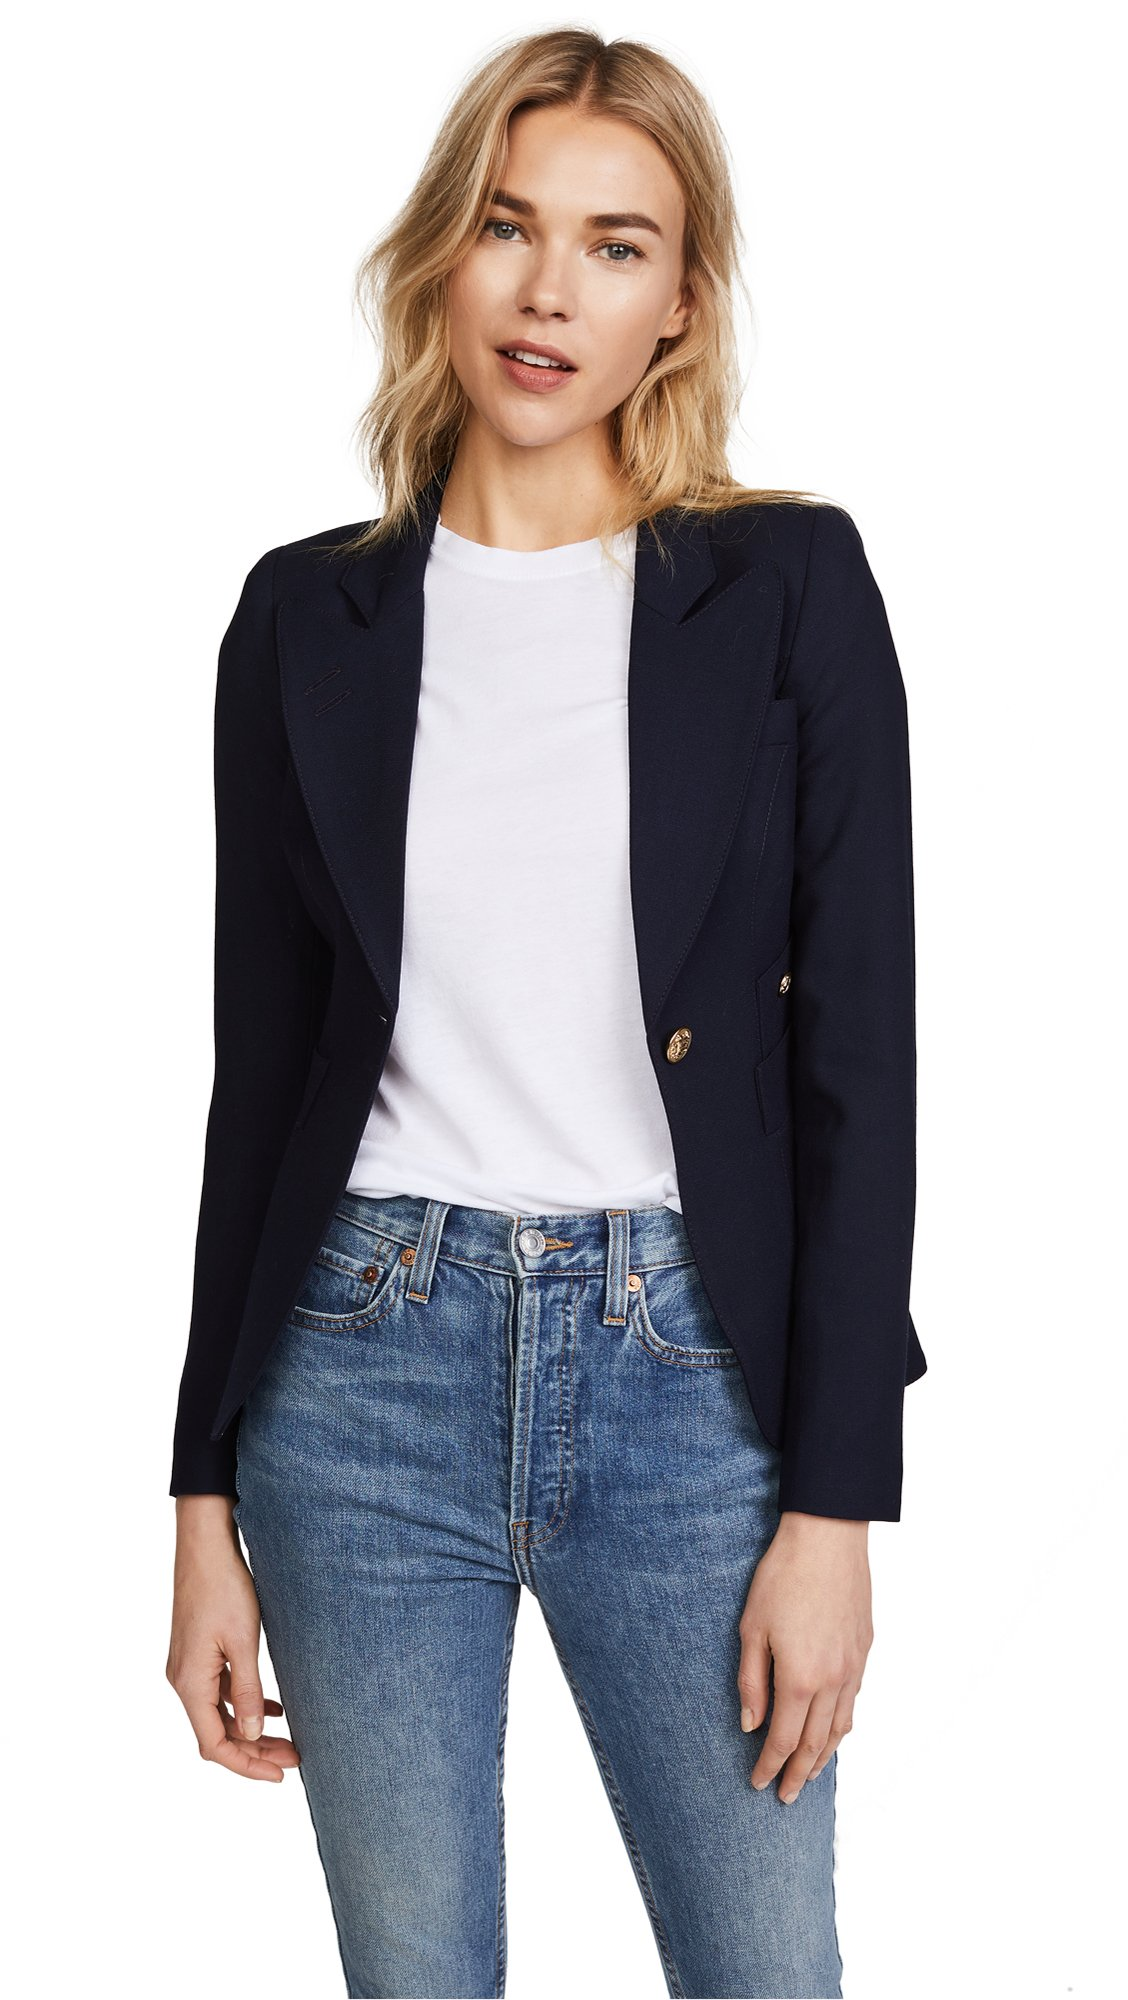 SMYTHE Women's One Button Blazer, Navy, 12